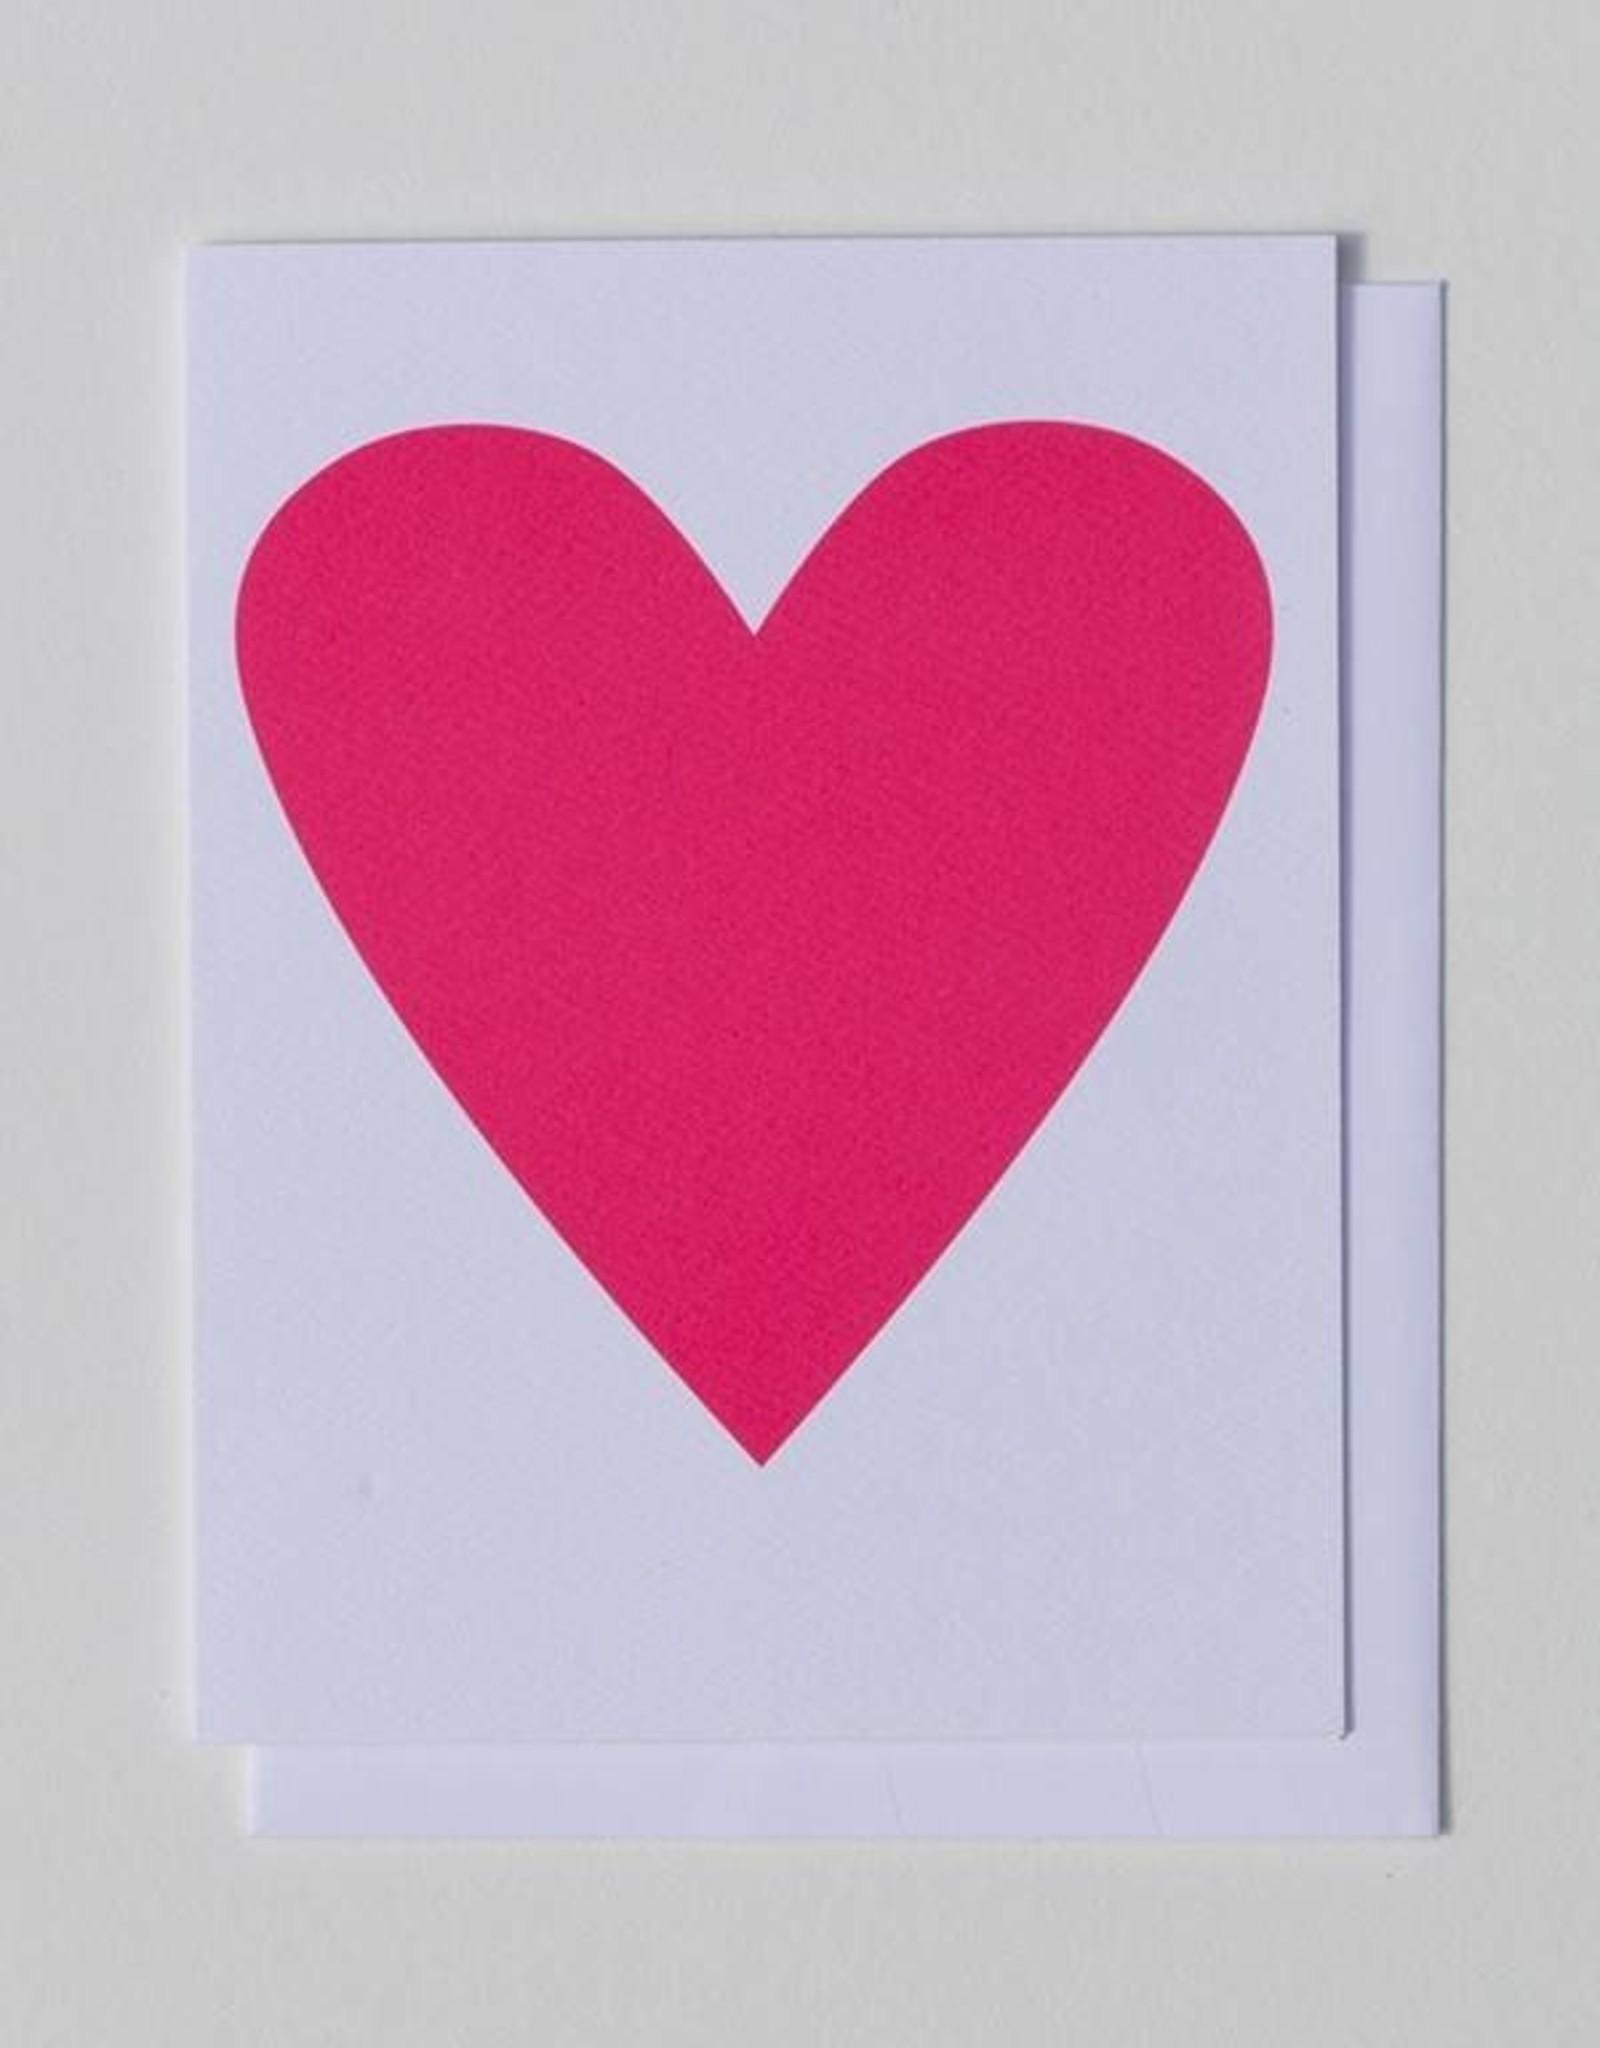 Banquet Atelier & Workshop Neon Heart Note Card